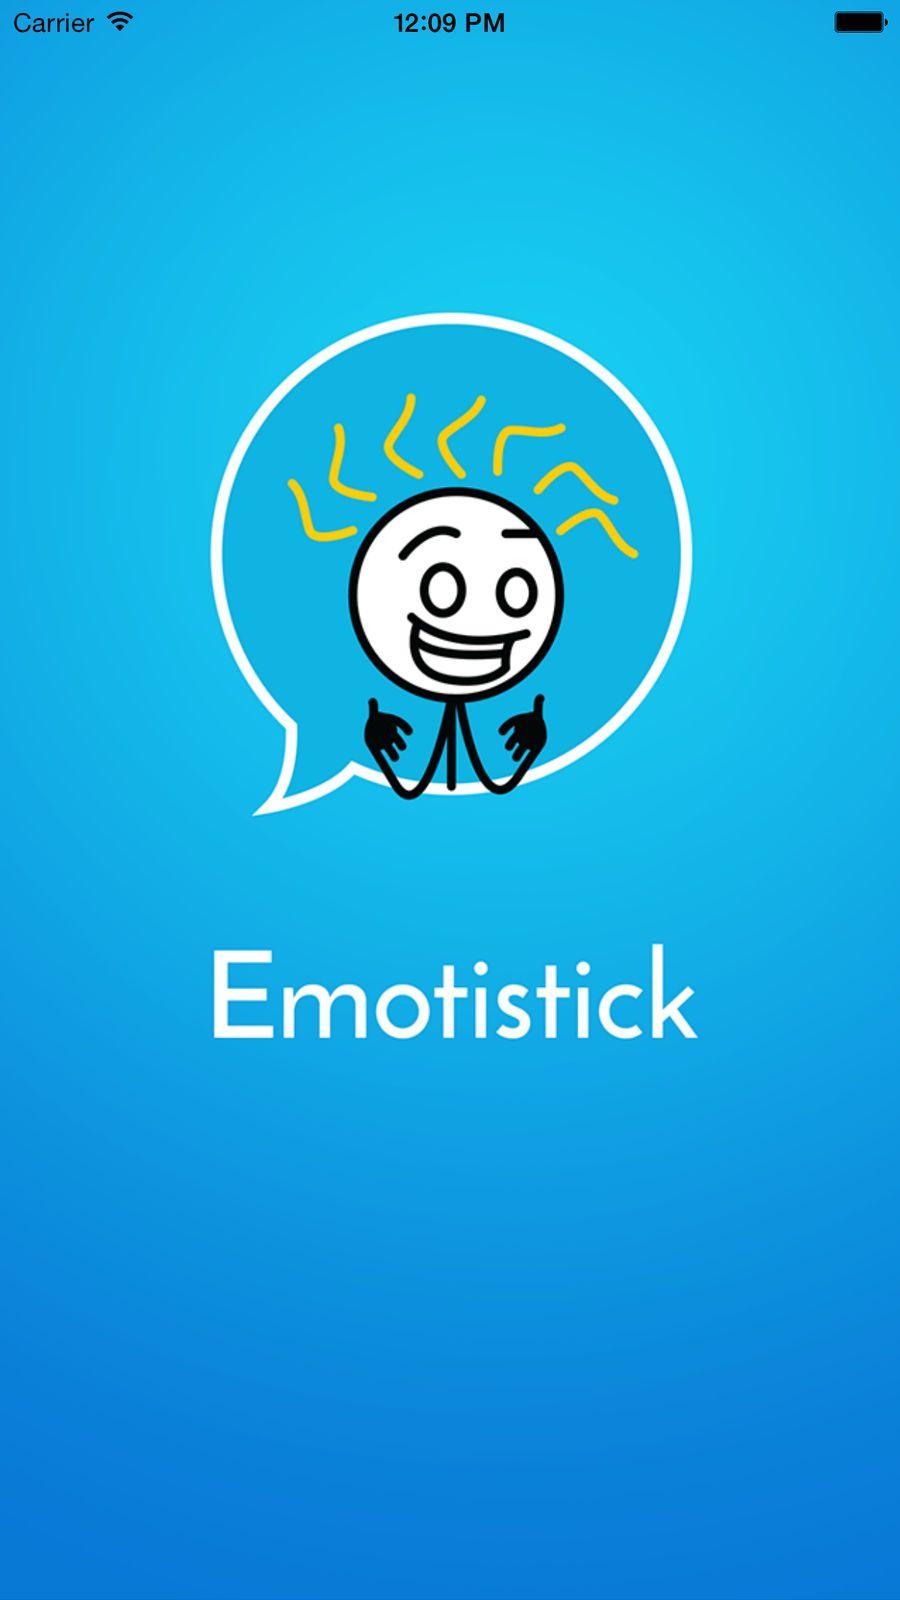 Emotistick animated text and imessage emoji emoticon